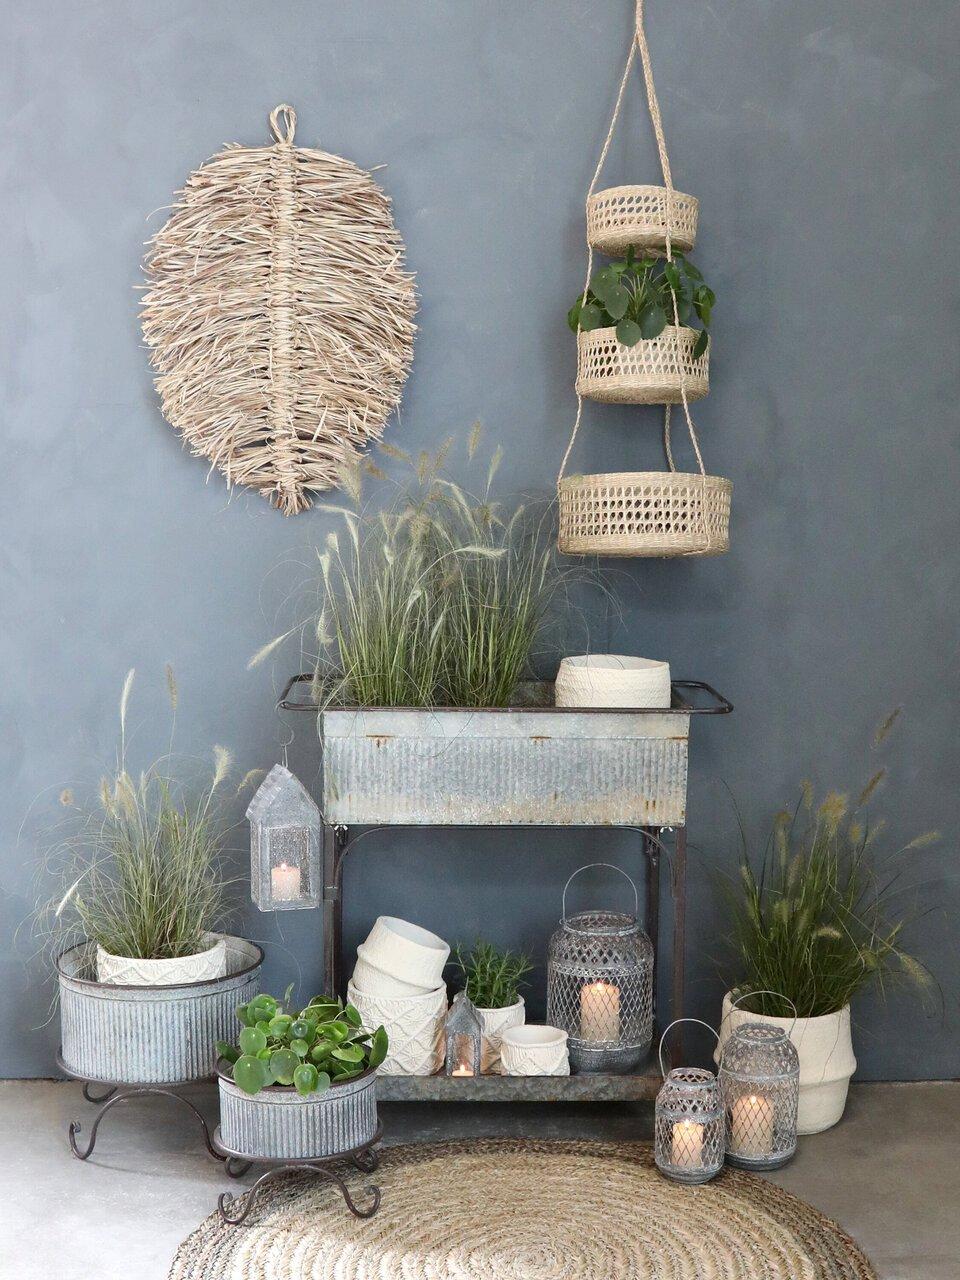 Natürliche Pflanzenecke